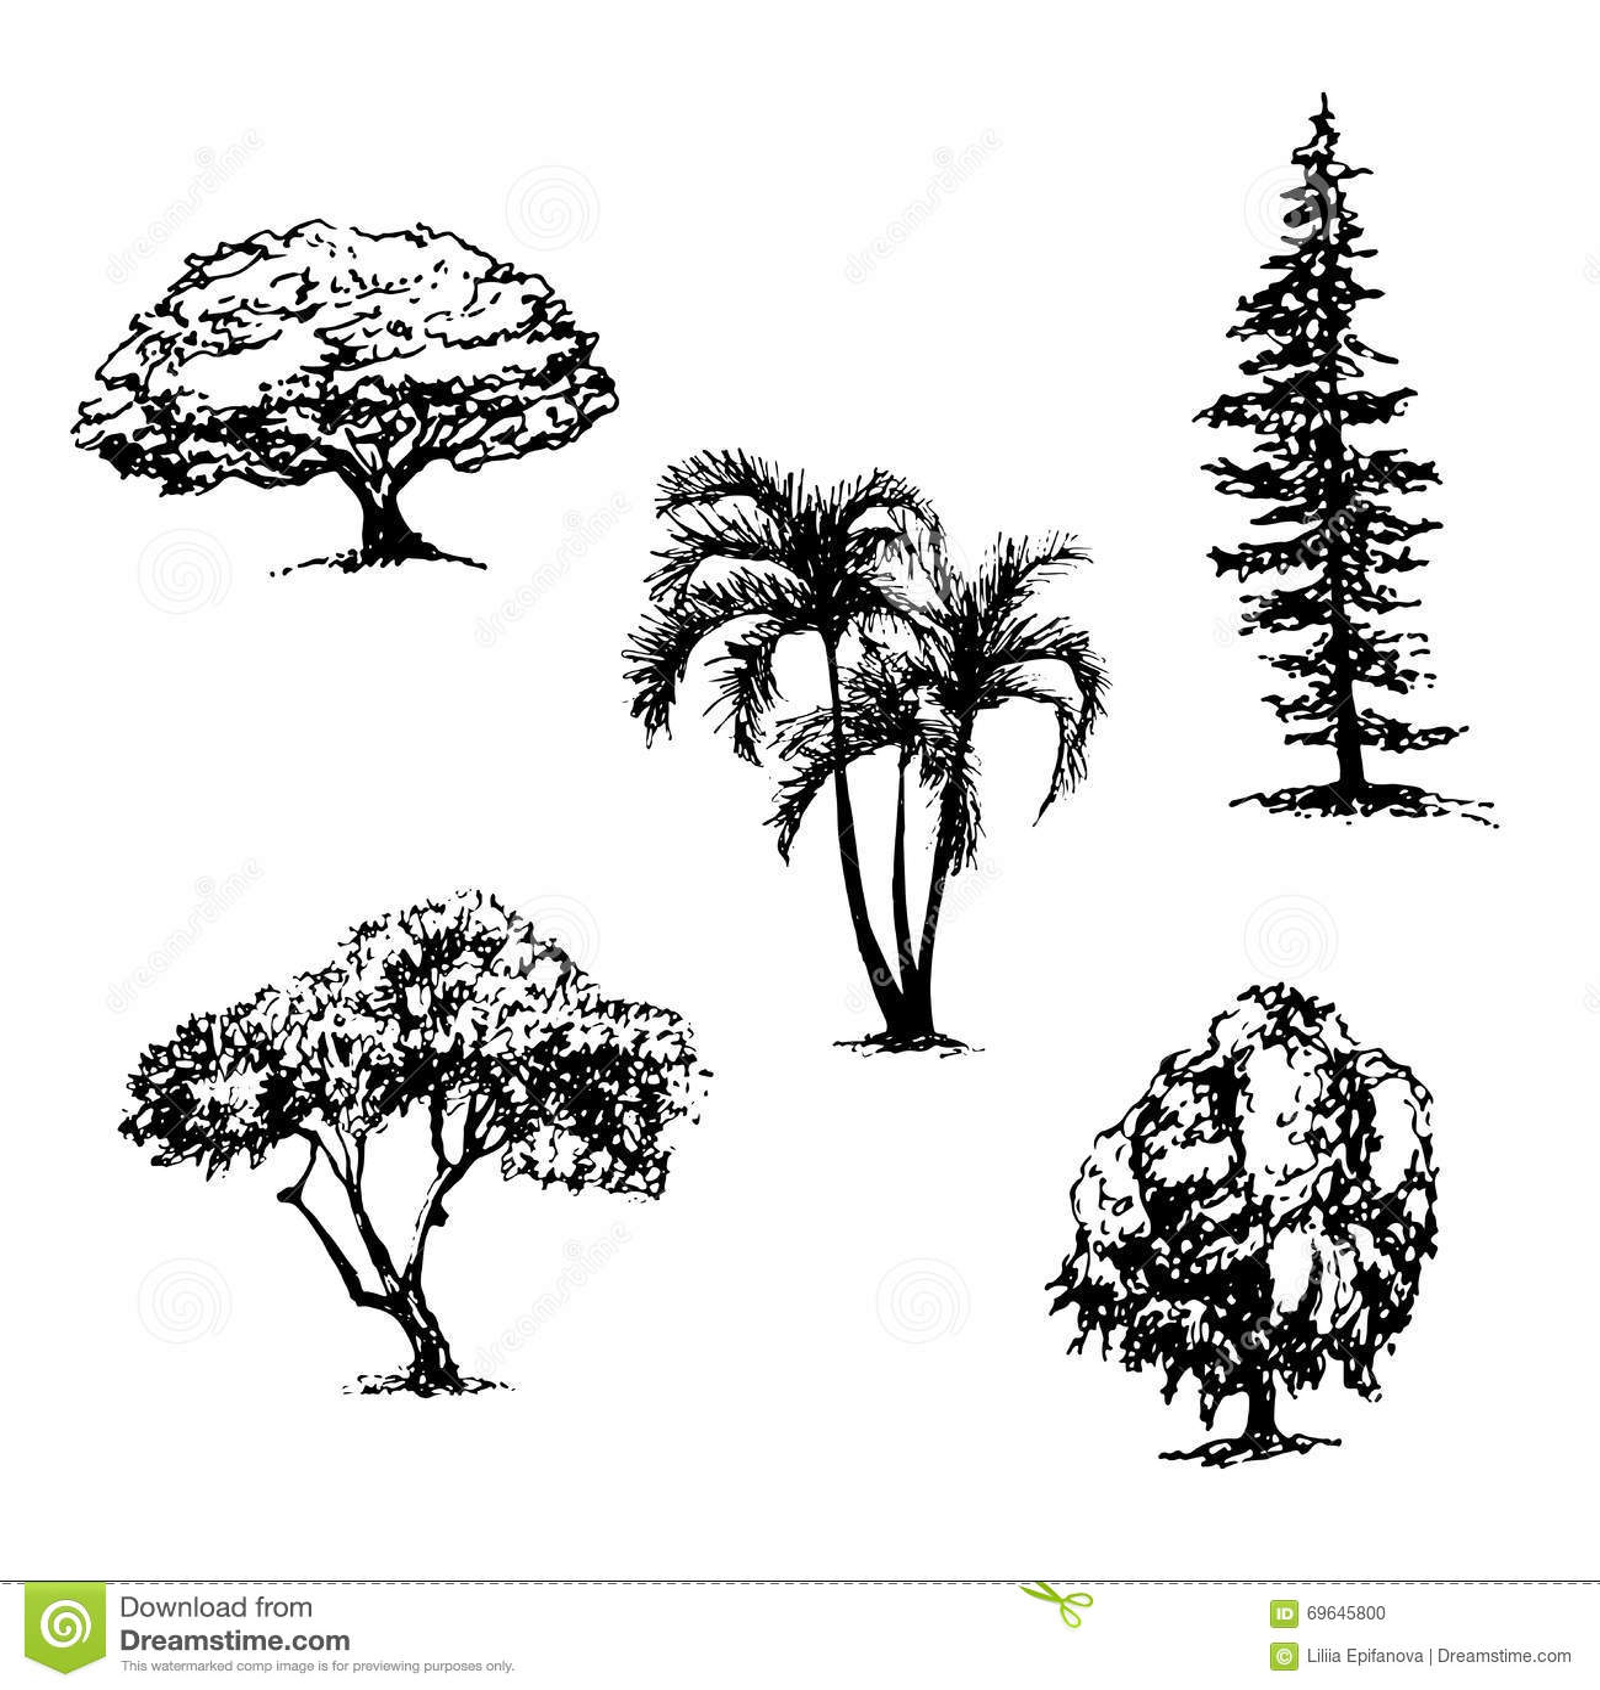 Collection de dessin d 39 illustration de croquis de 5 arbres - Dessins d arbre ...